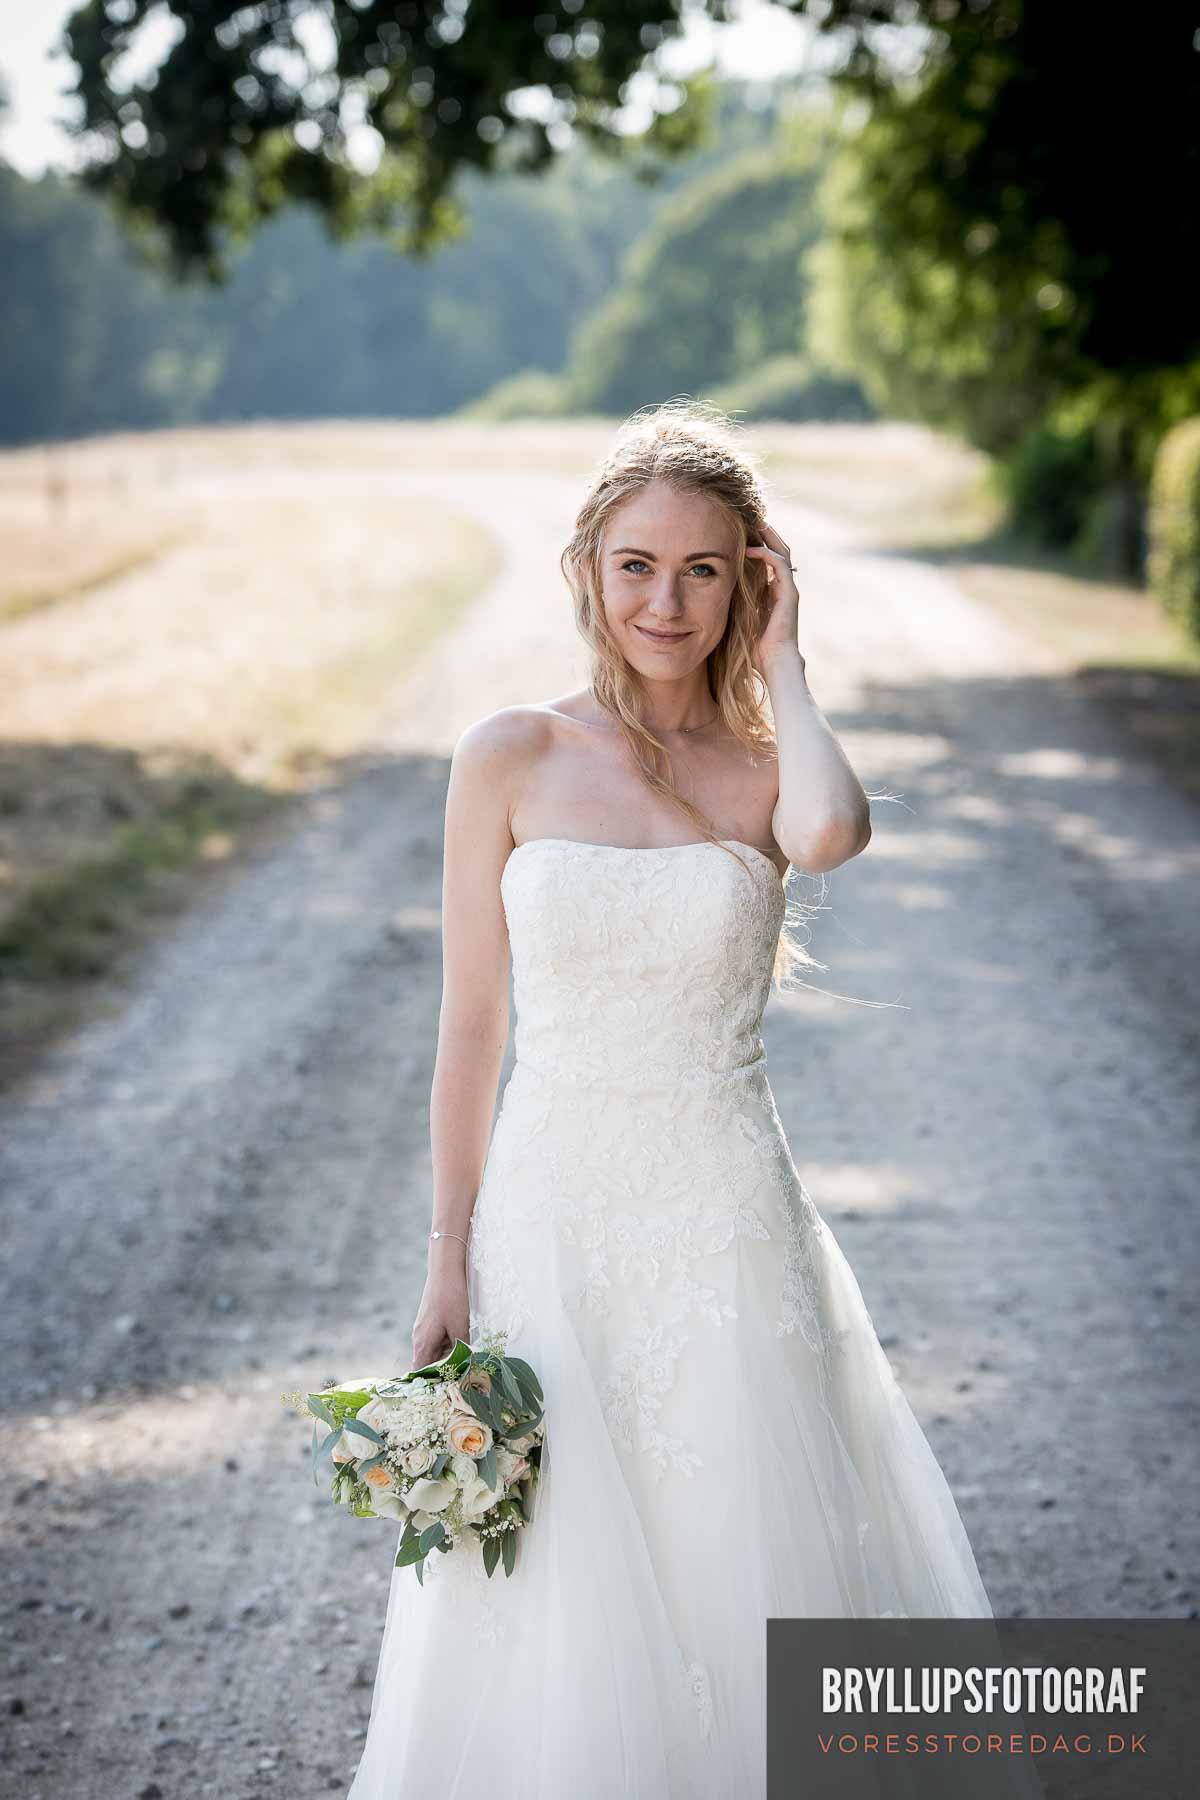 Bryllup det er jeres eventyr